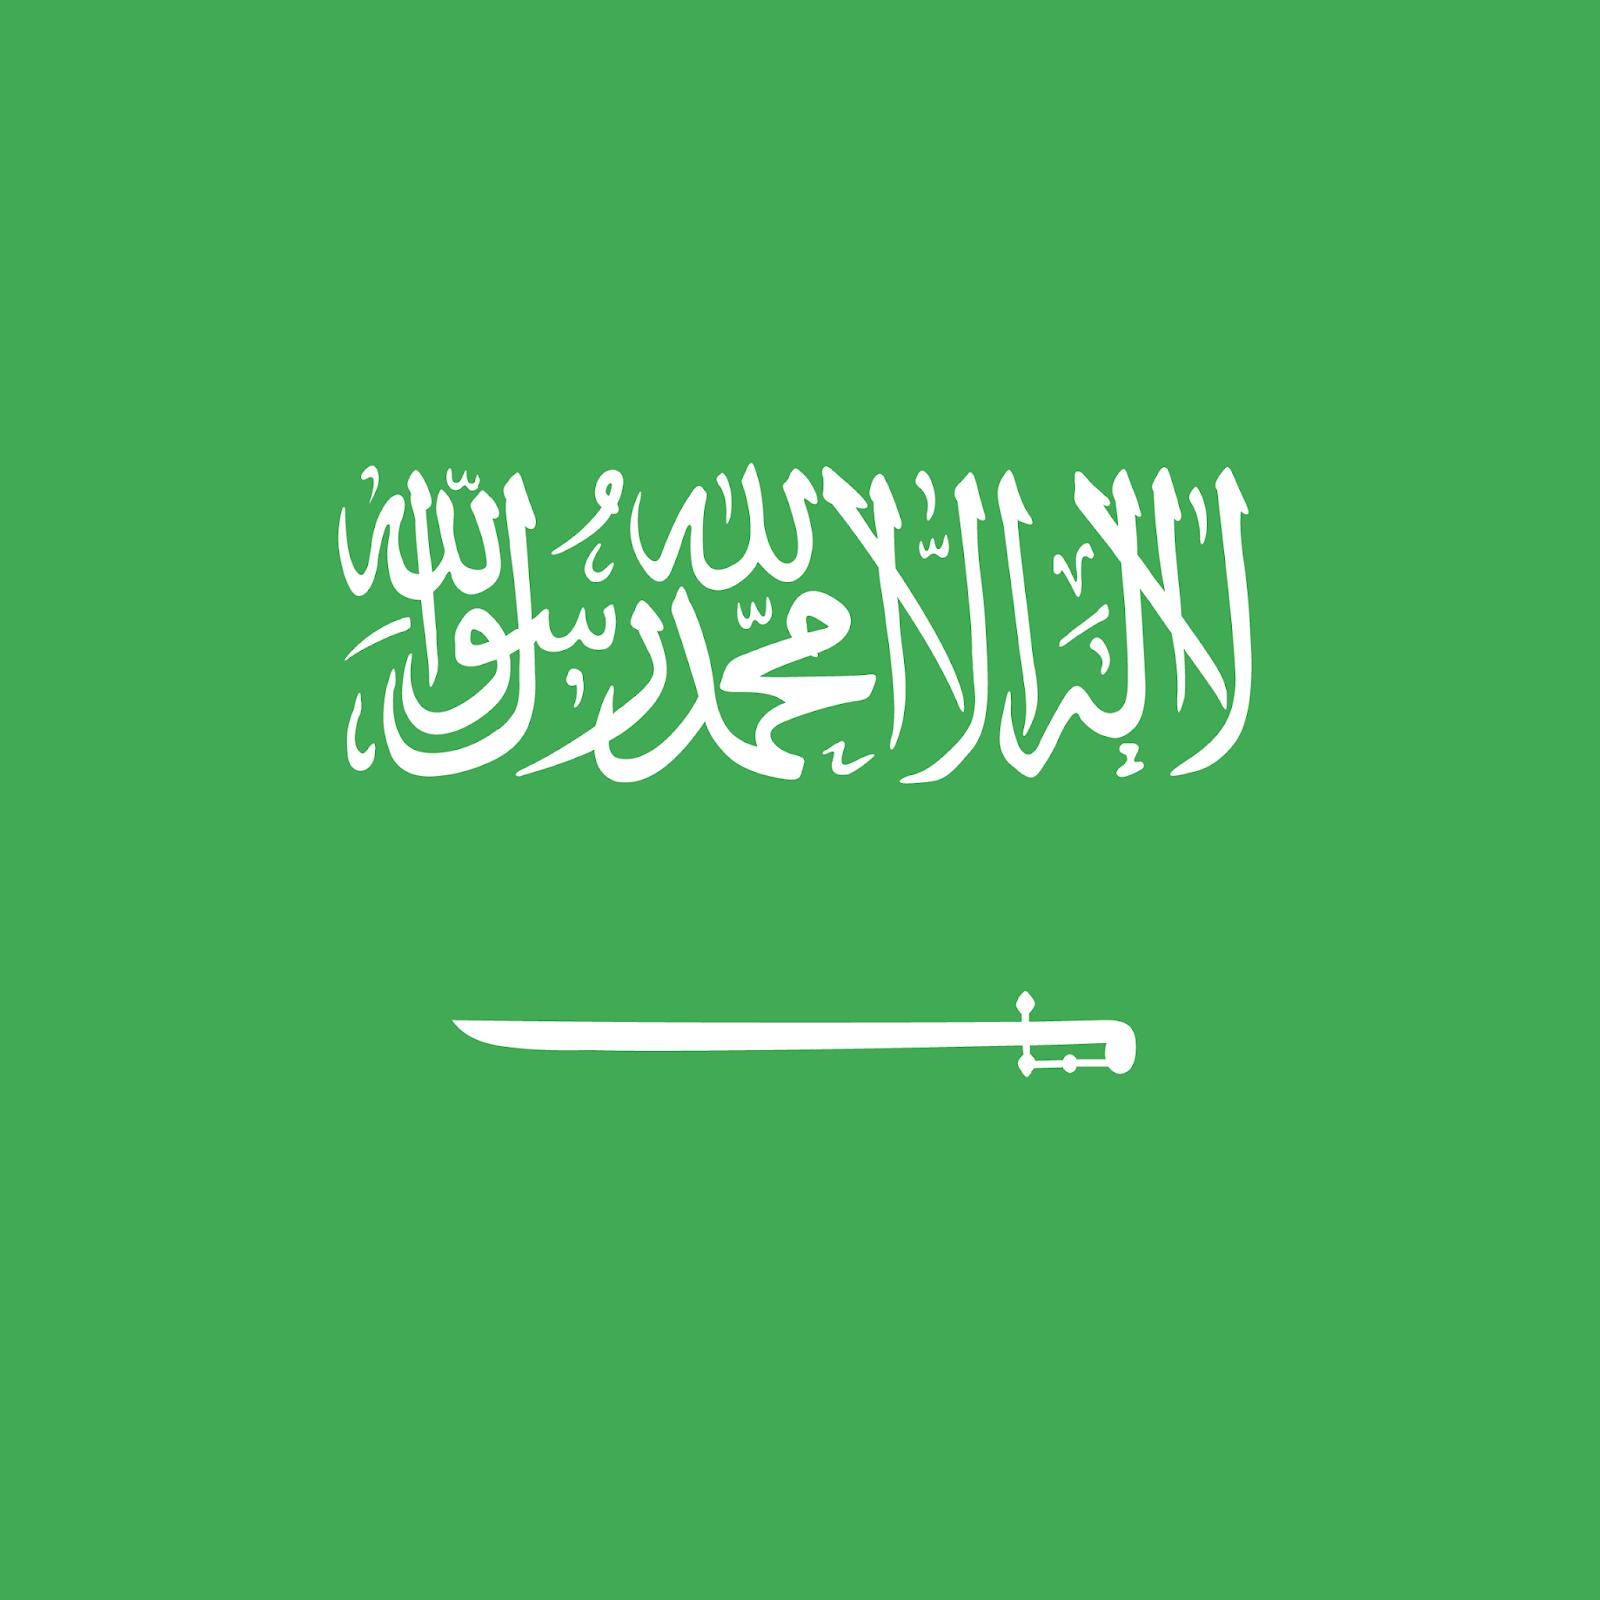 صور وخلفيات علم السعودية اجمل الصور لعلم السعودية 2018 الصور Saudi Flag Saudi Arabia Flag Album